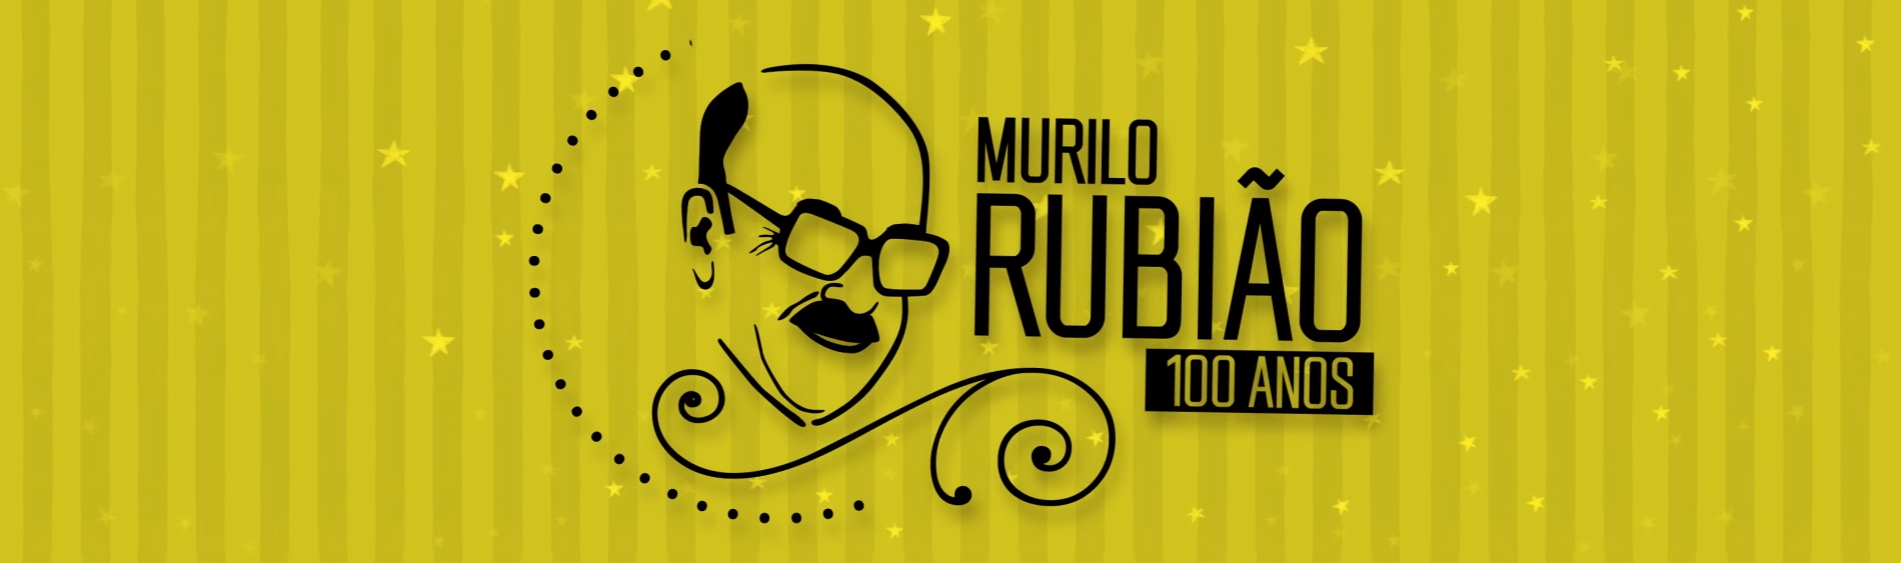 muriloR